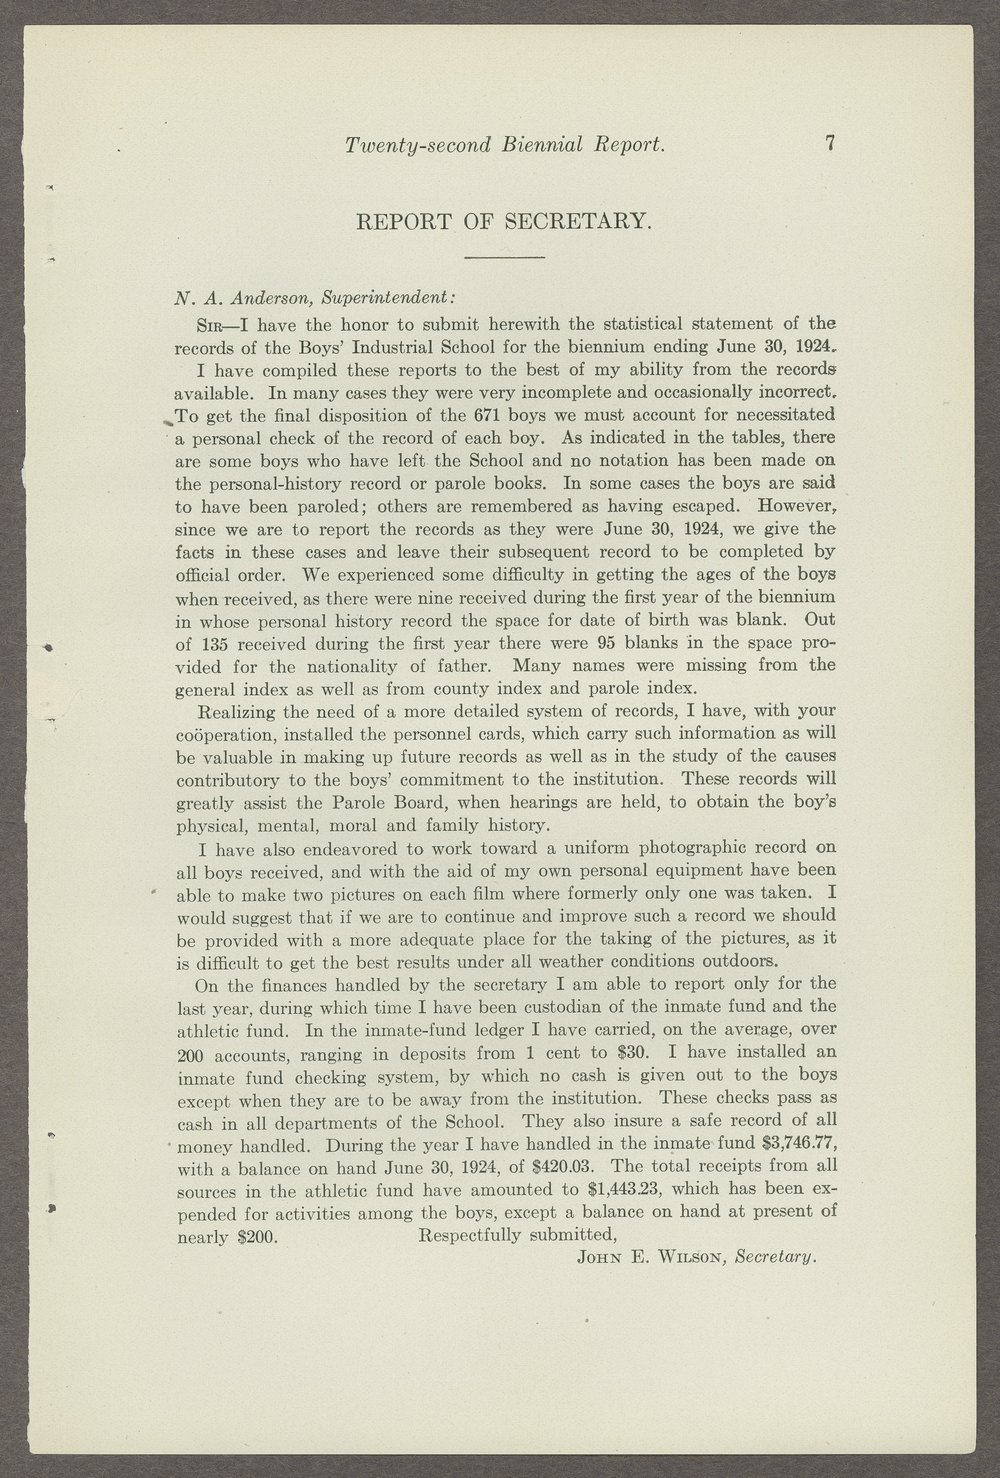 Biennial report of the Boys Industrial School, 1924 - 7